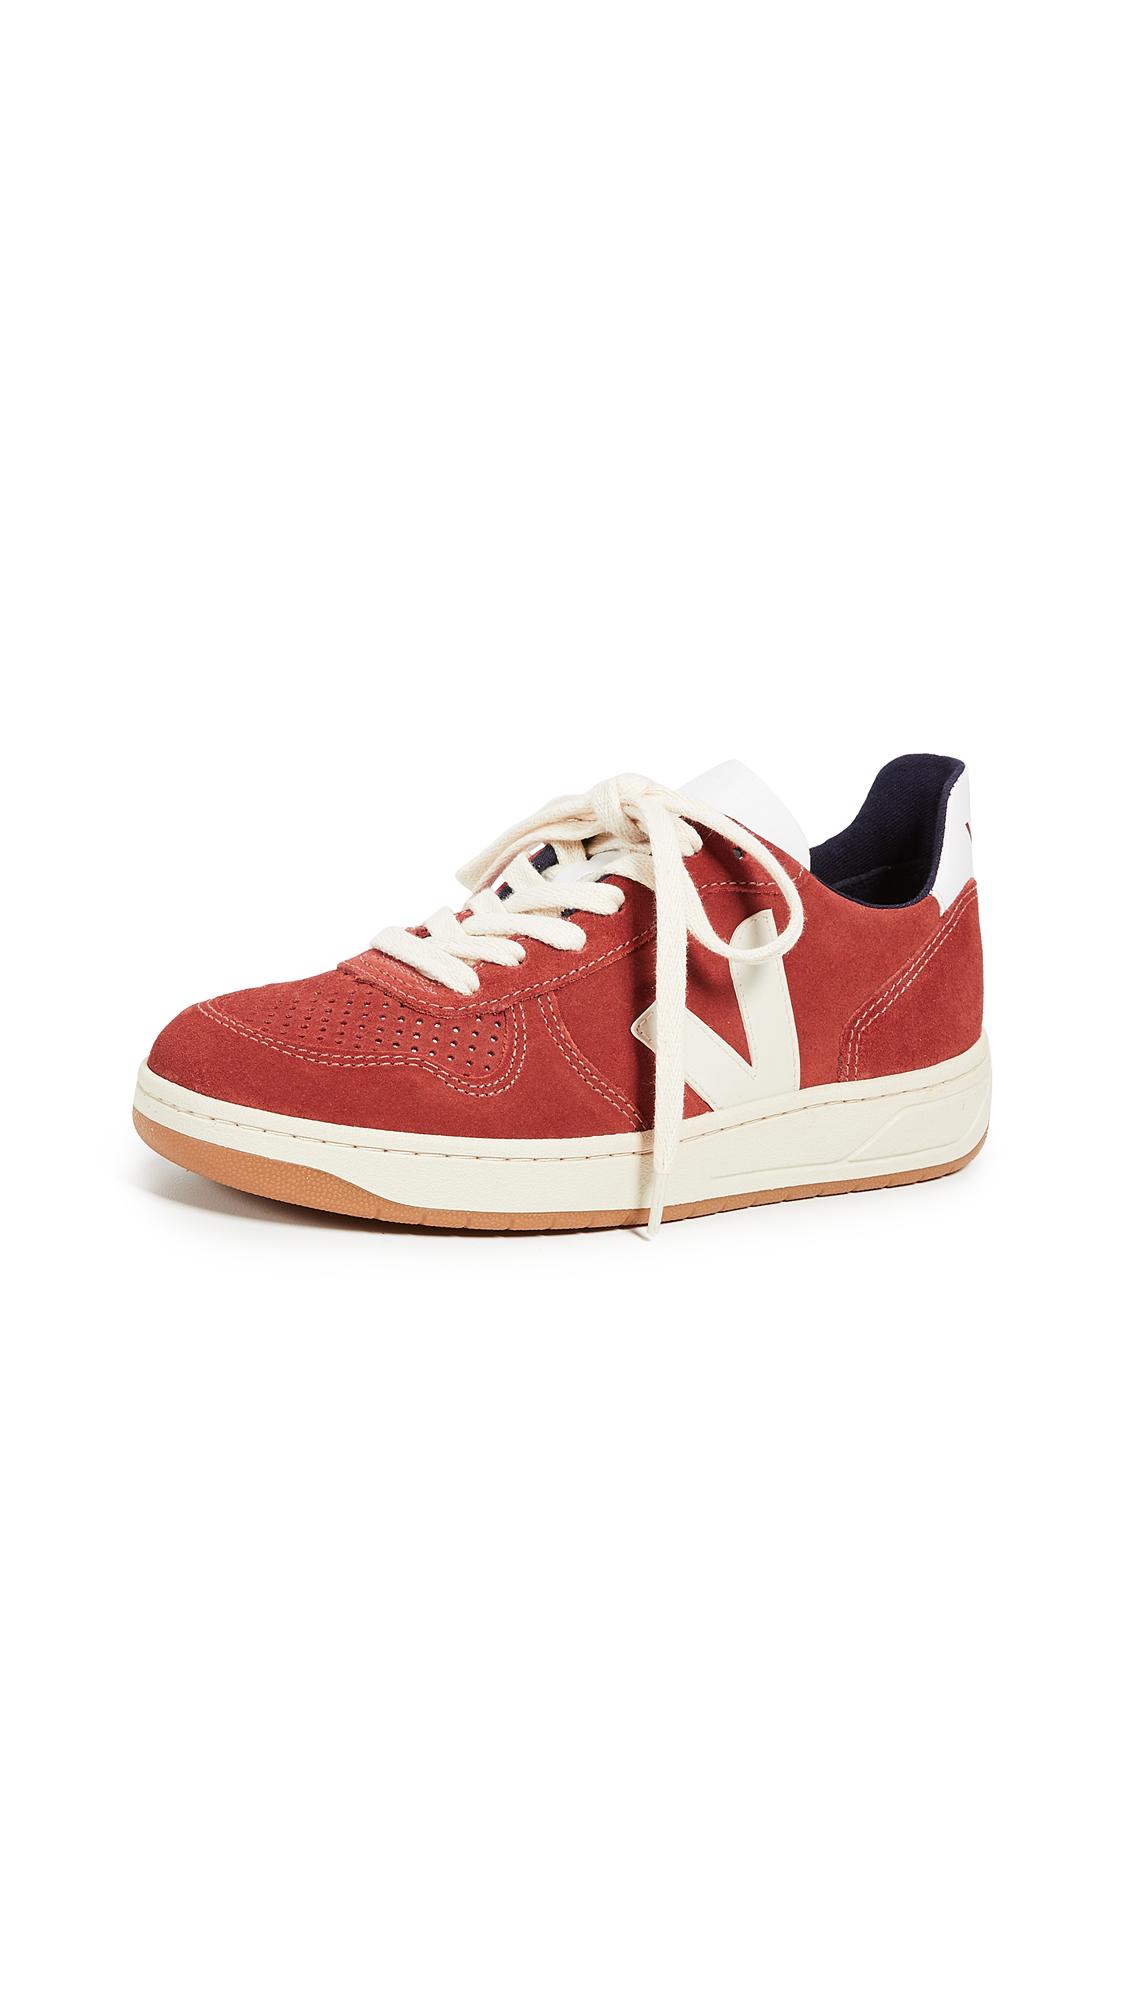 Veja V-10 Sneakers - Rouille Pierre